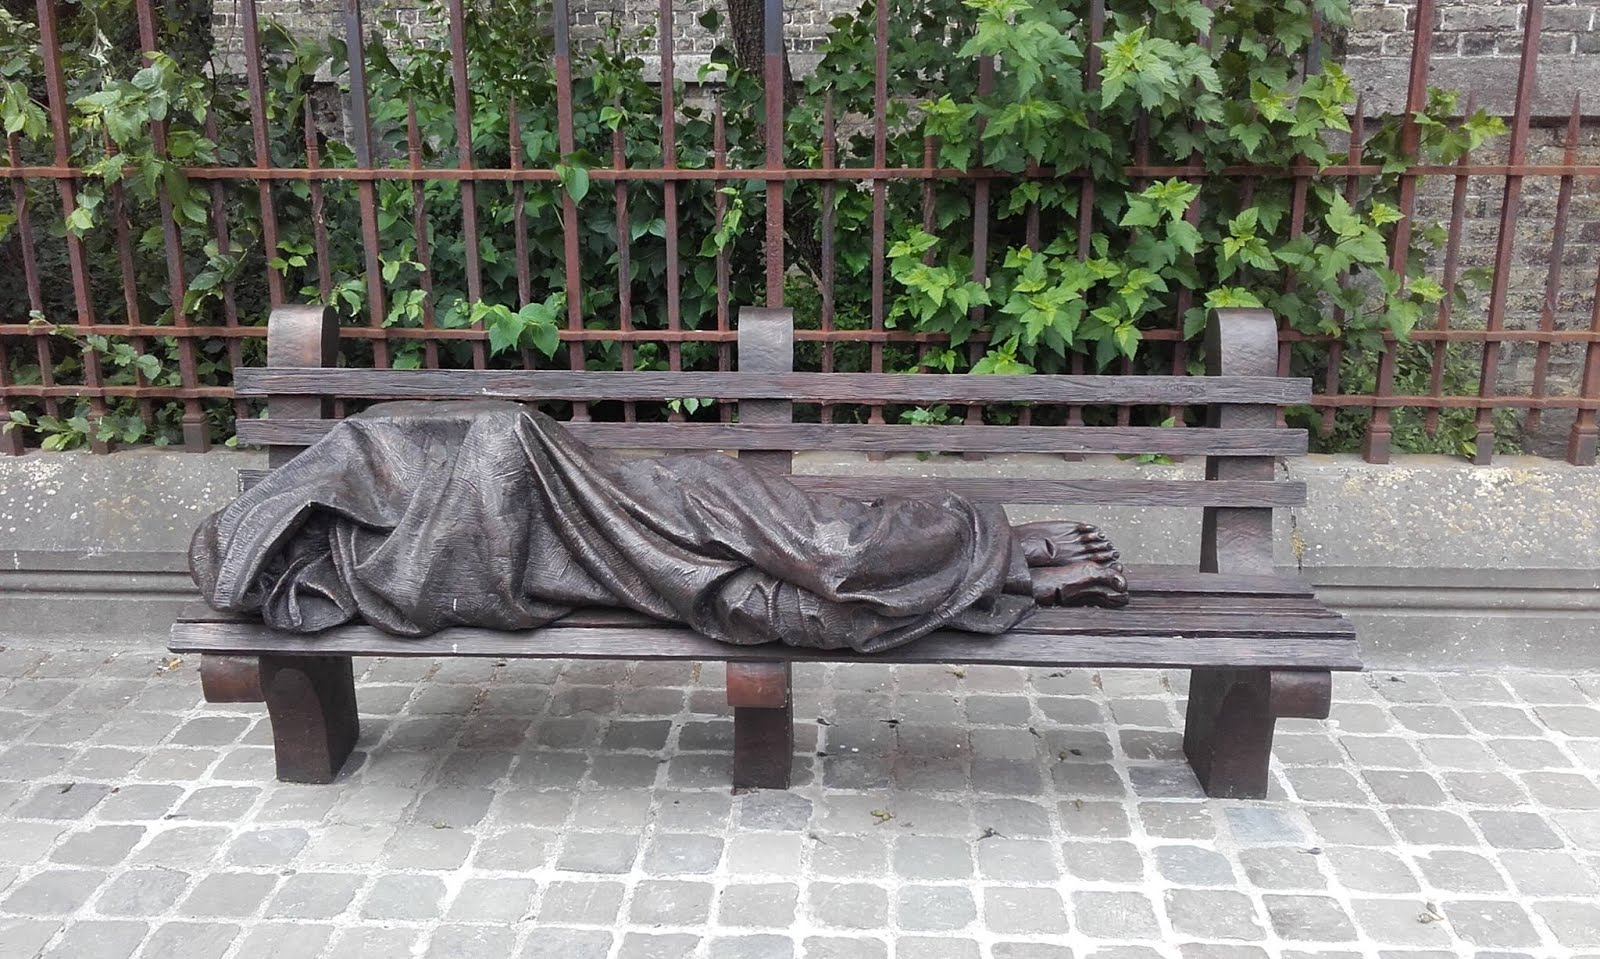 Homeless in Brugge